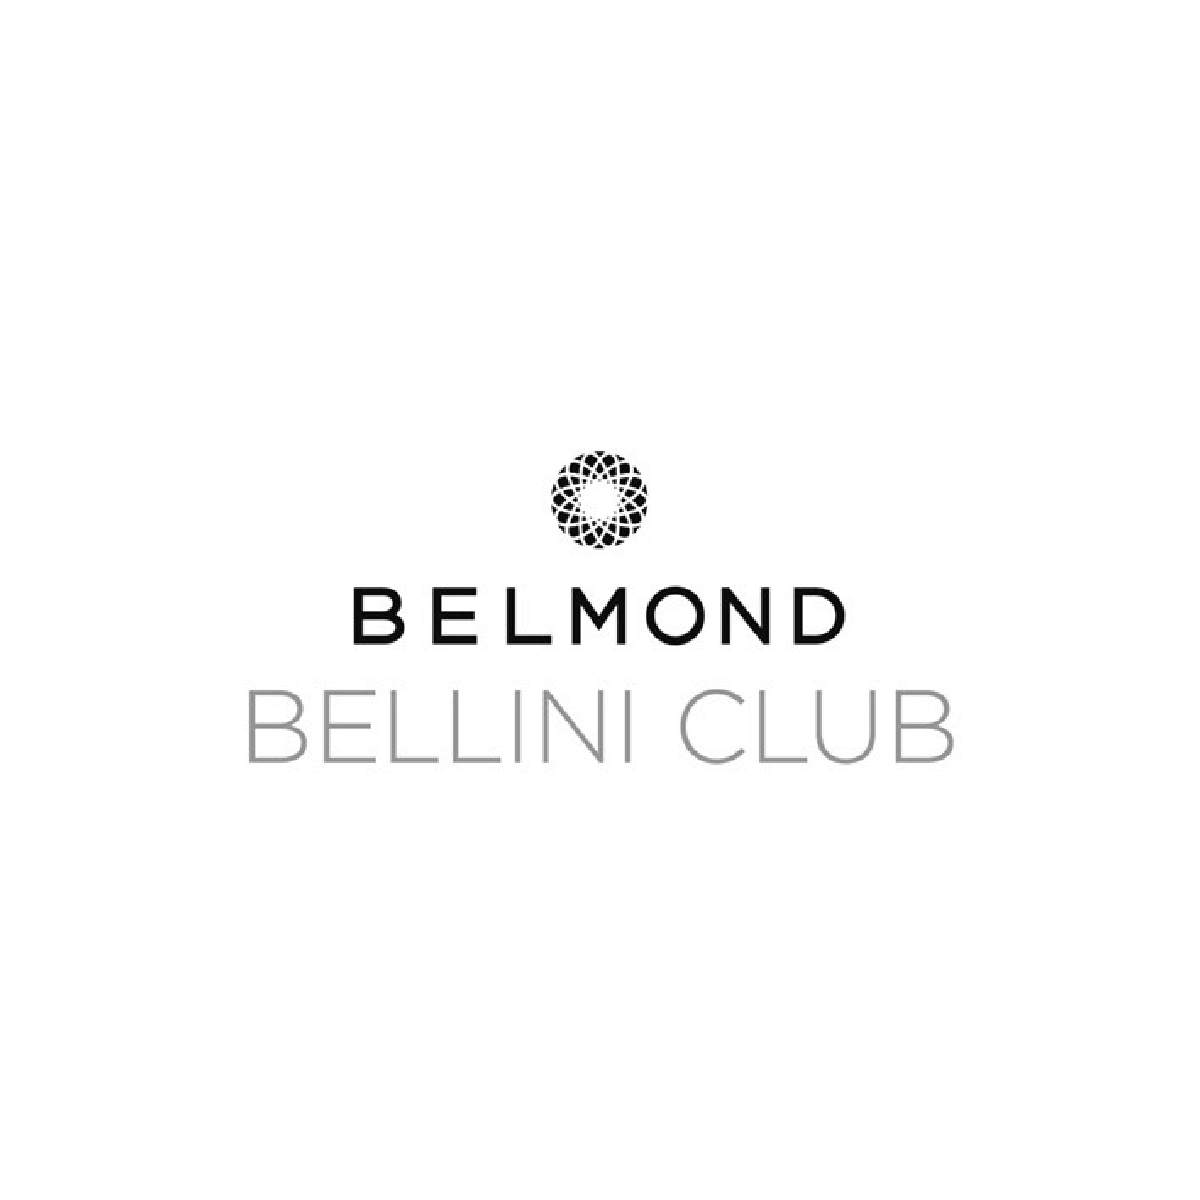 Insider_Belmond-01.png